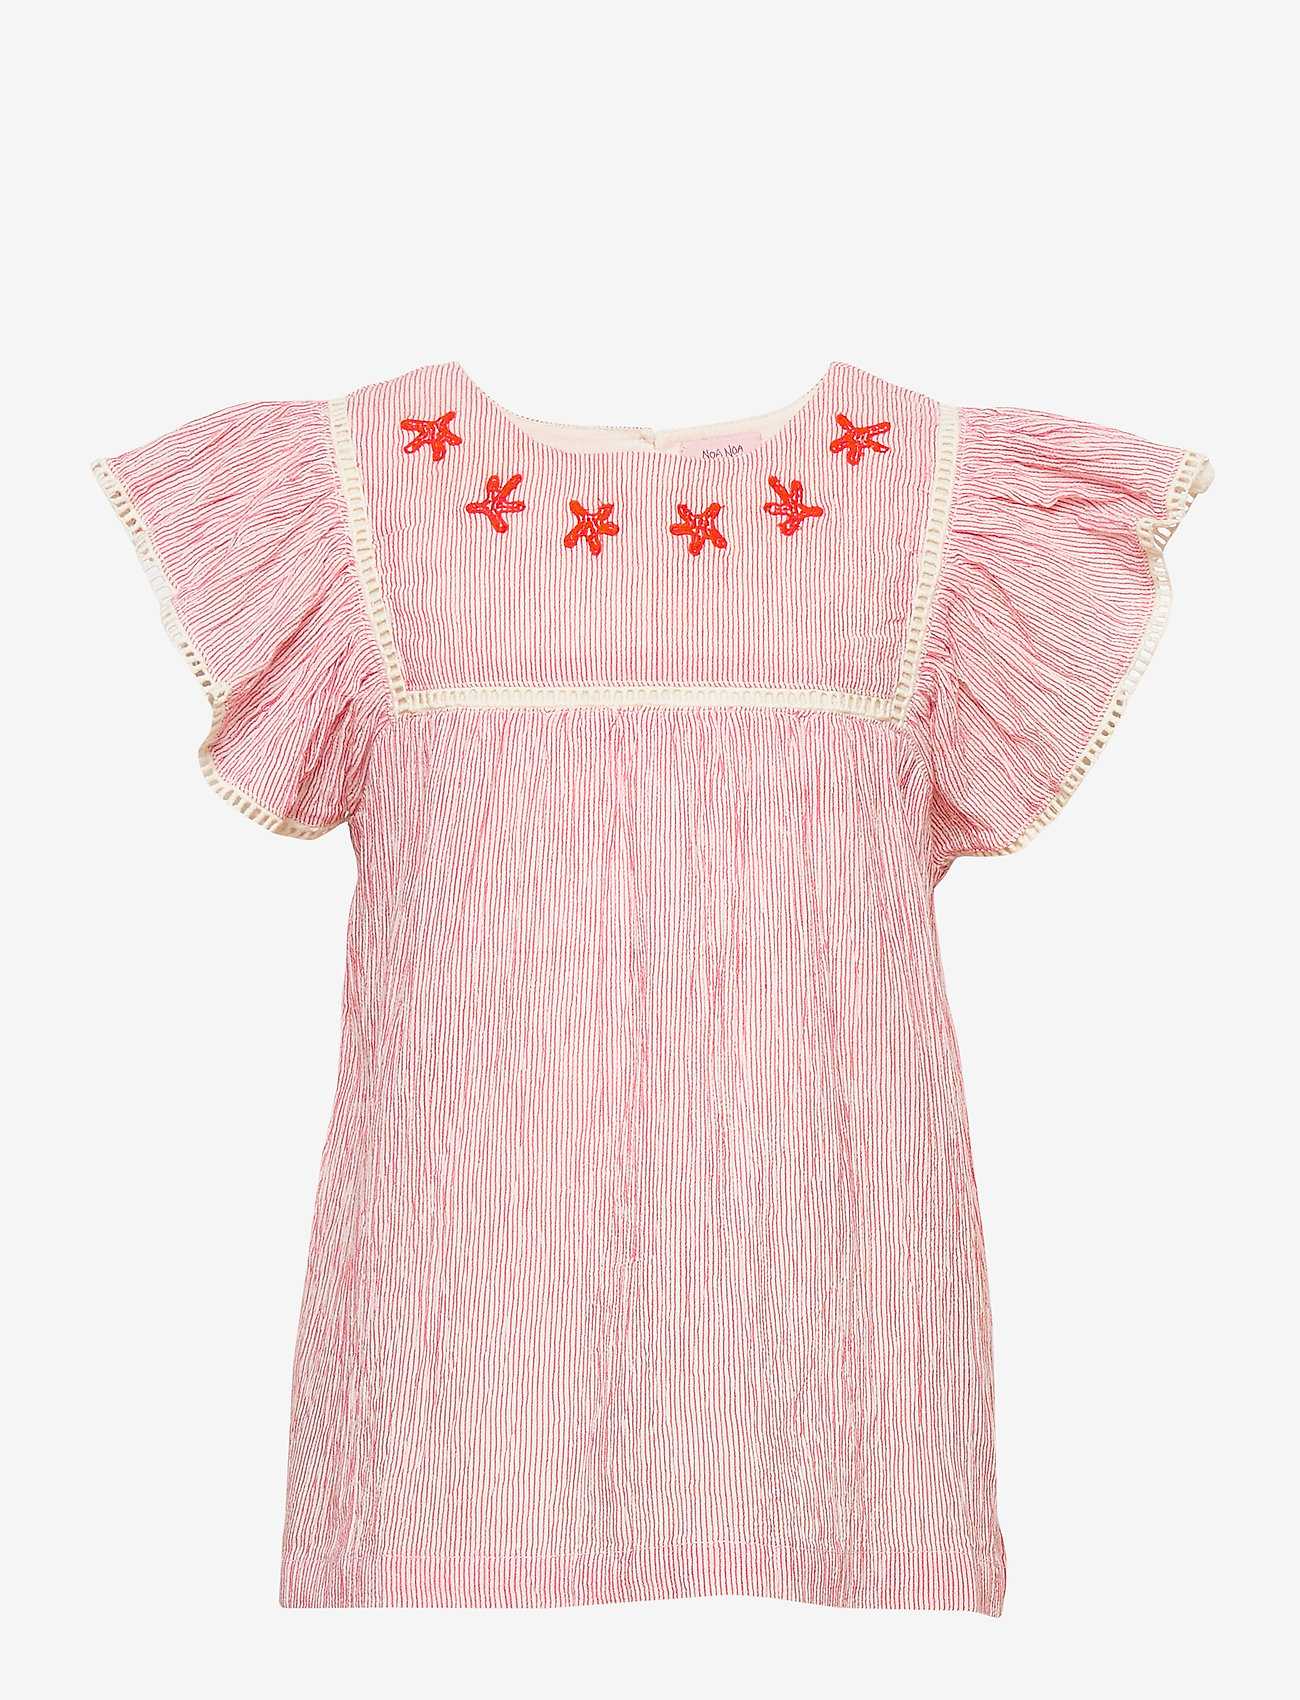 Noa Noa Miniature - Top - blouses & tunics - paprika - 0